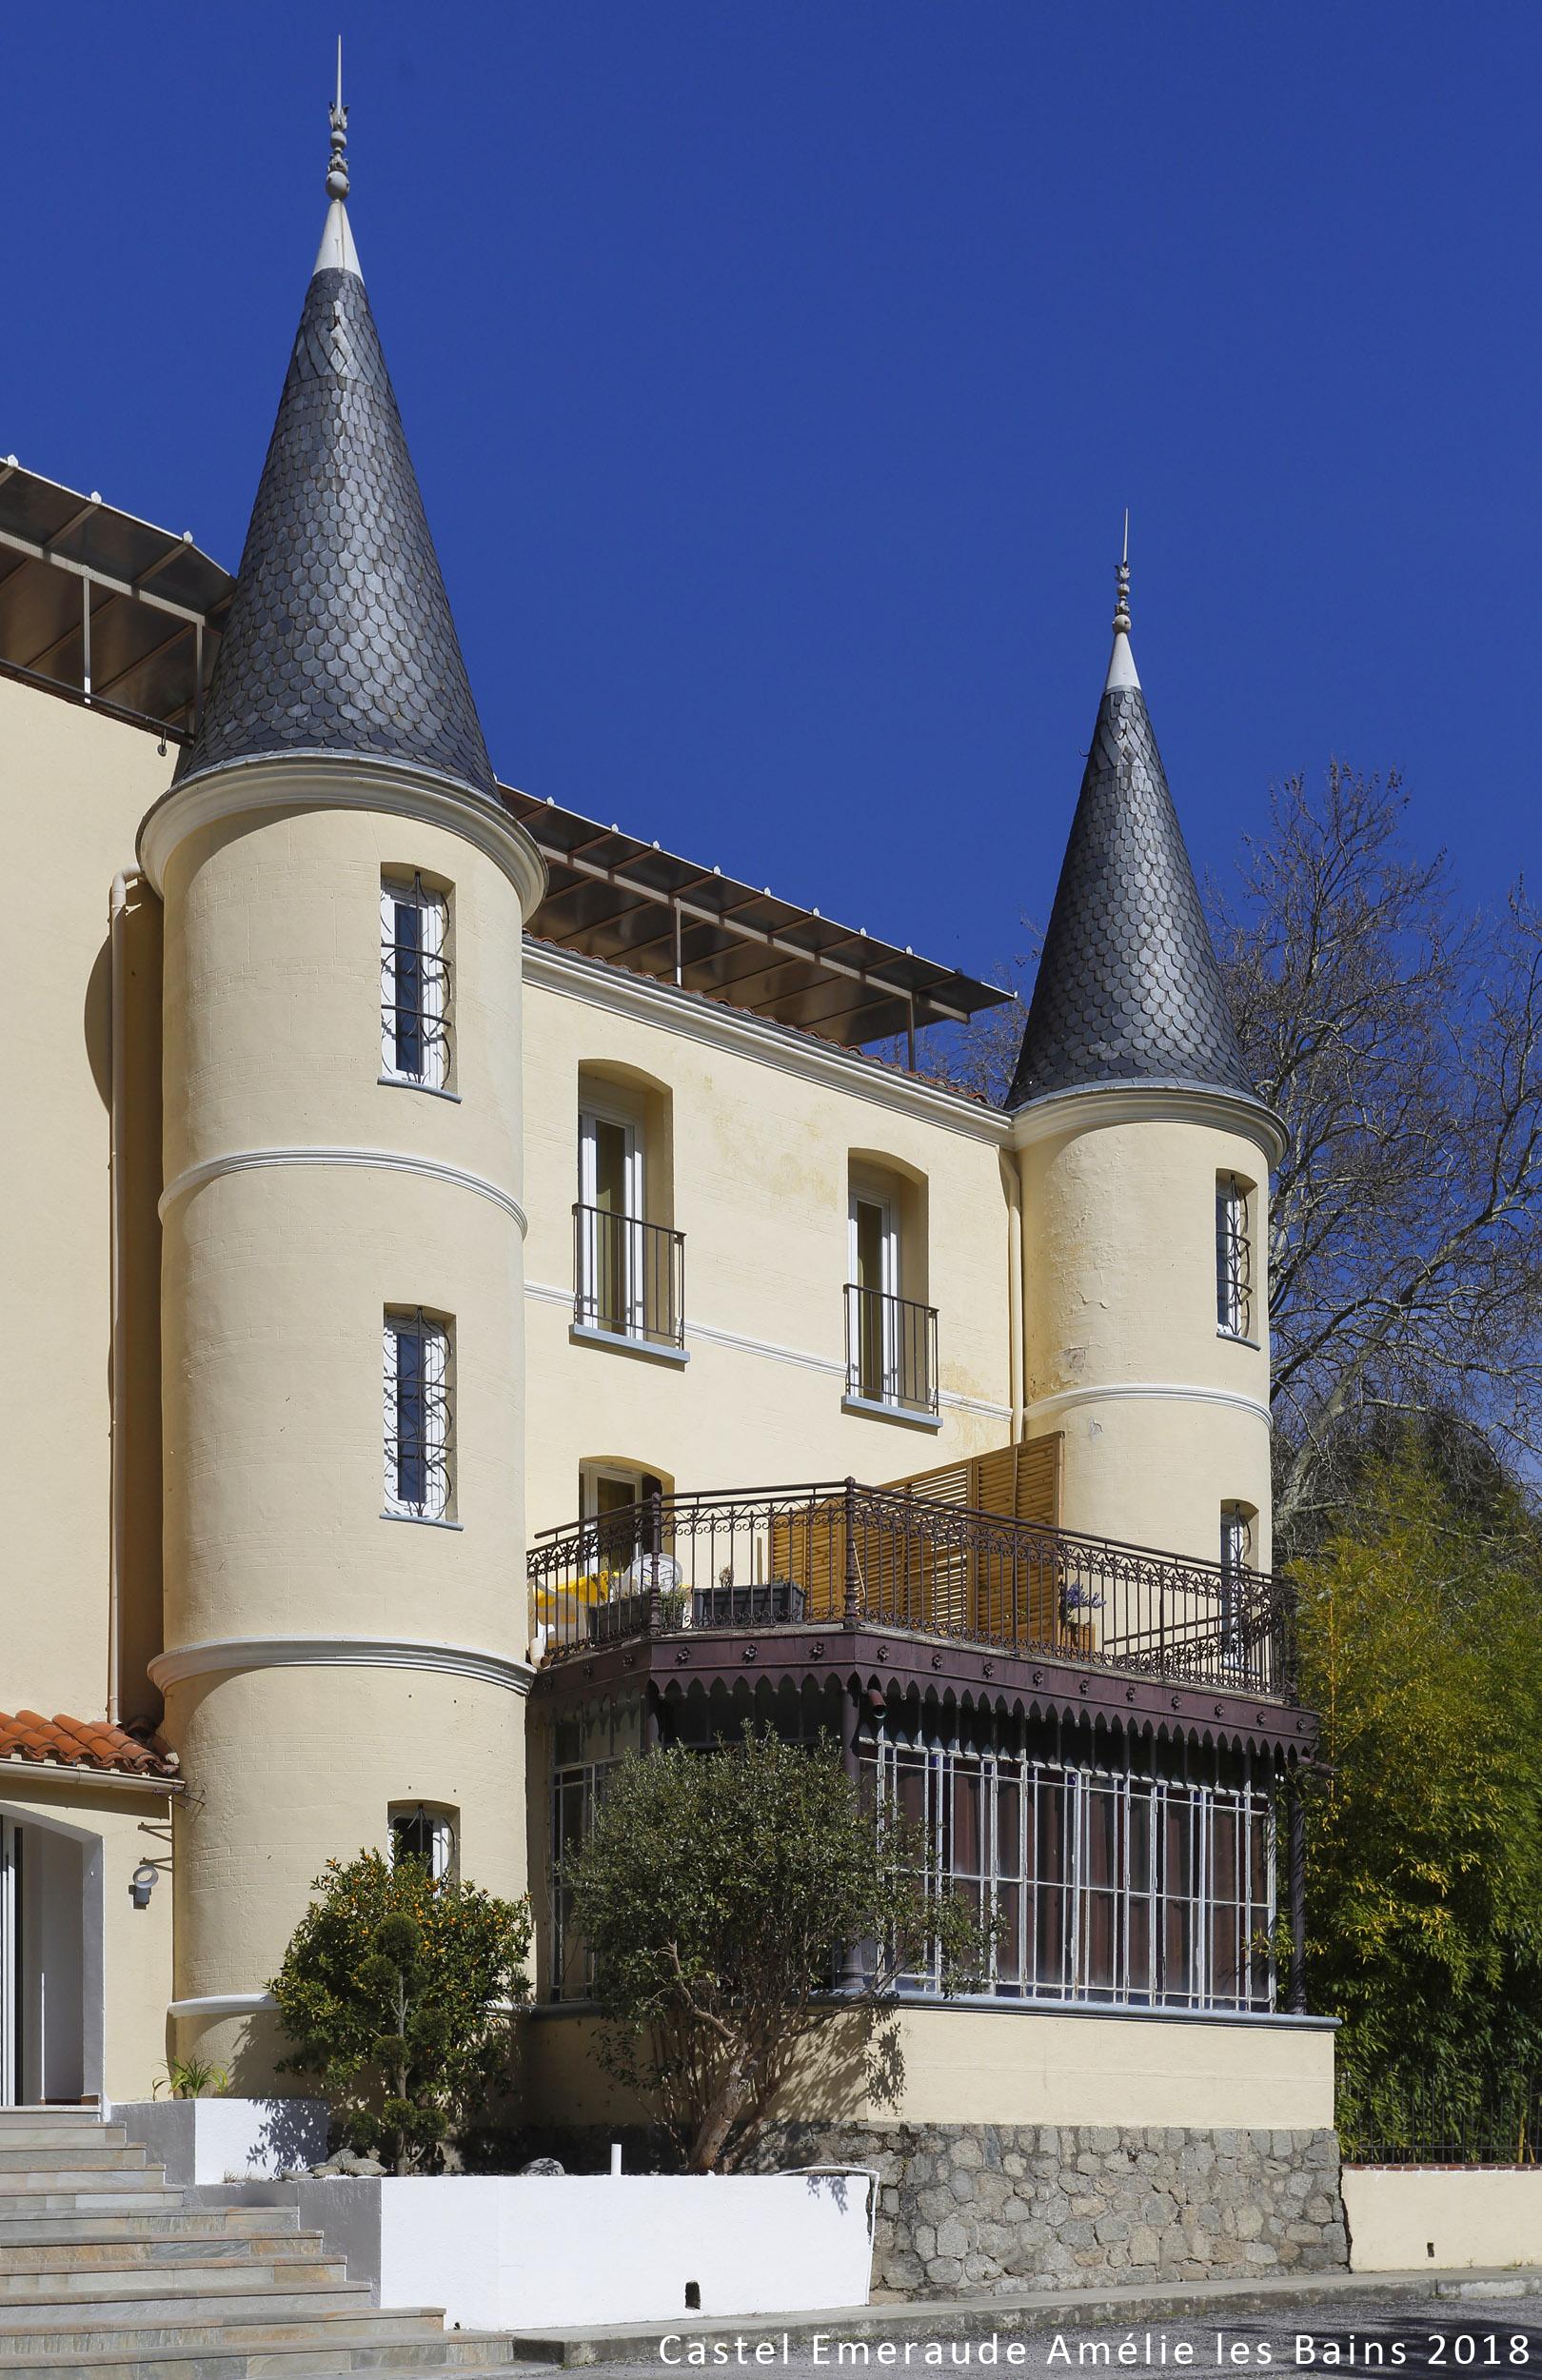 Castel Émeraude